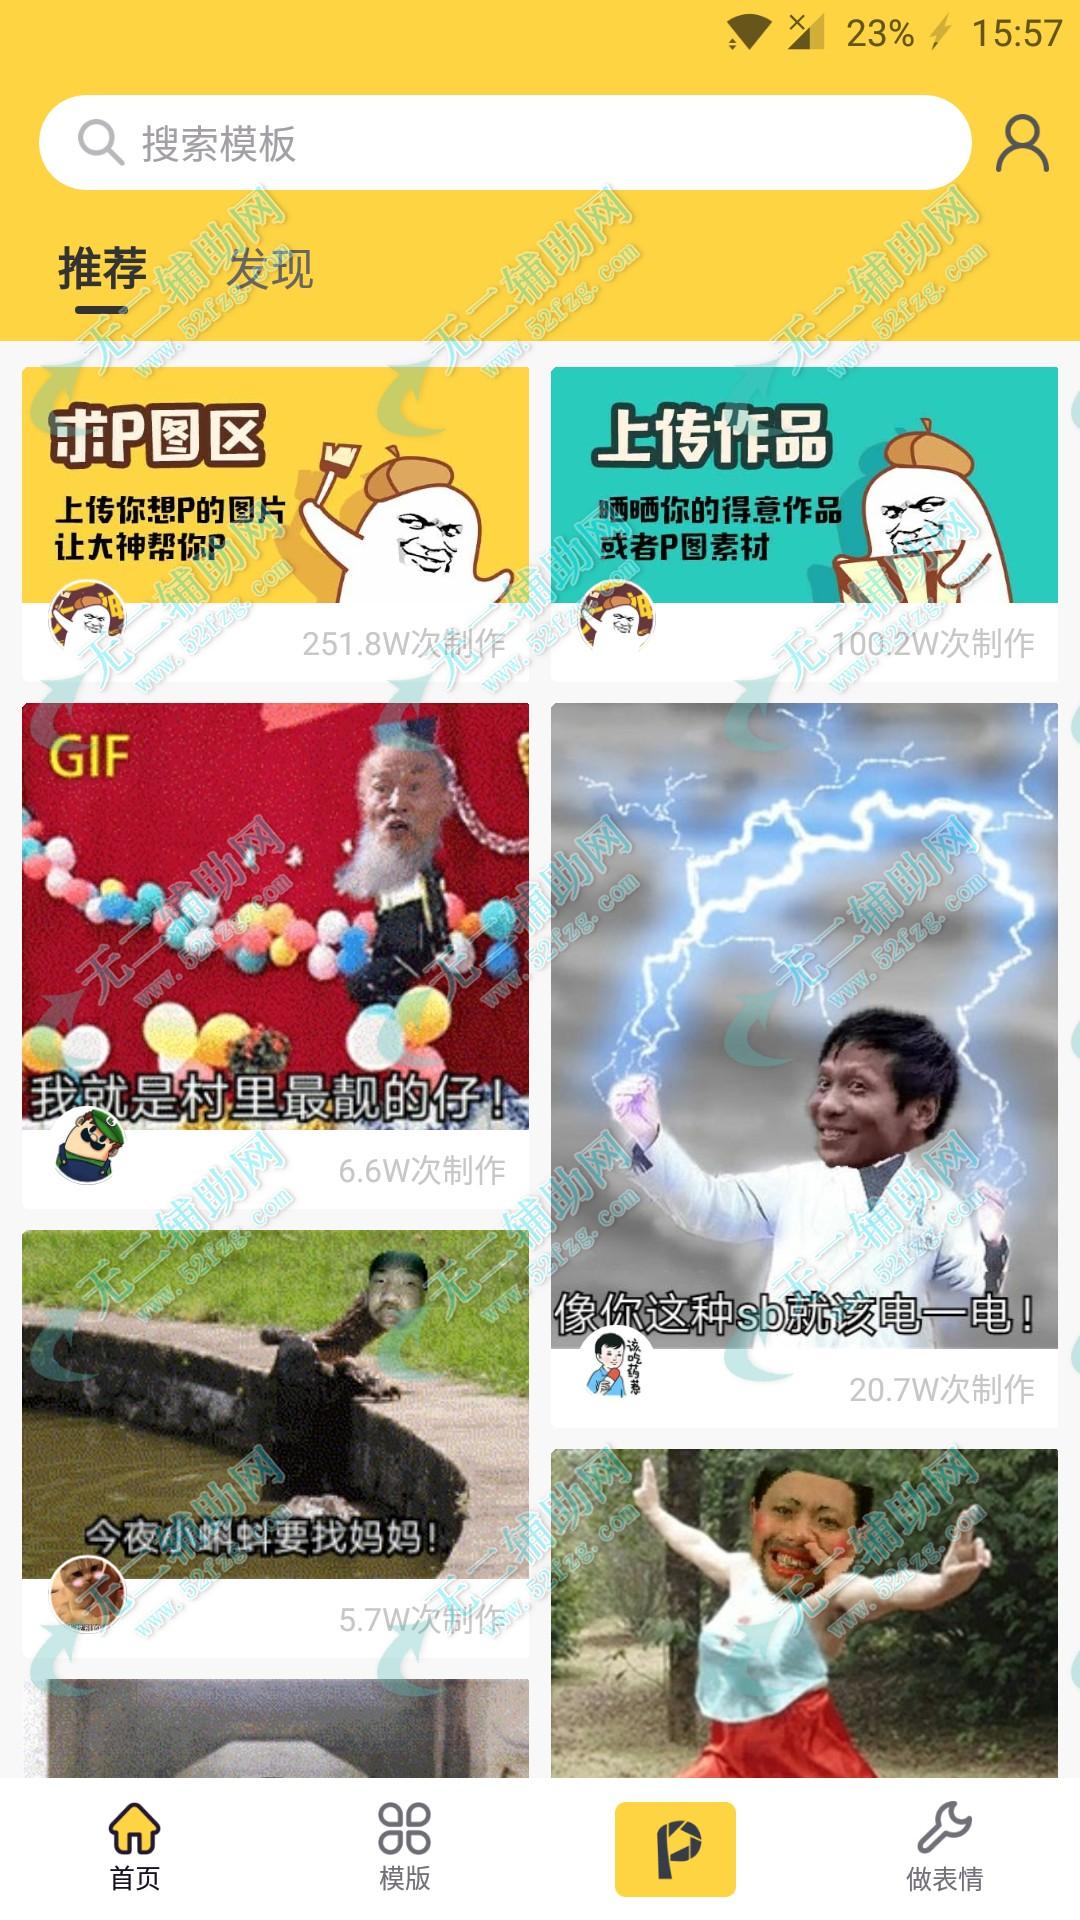 p图大神表情包gif图片制作APP安卓版下载